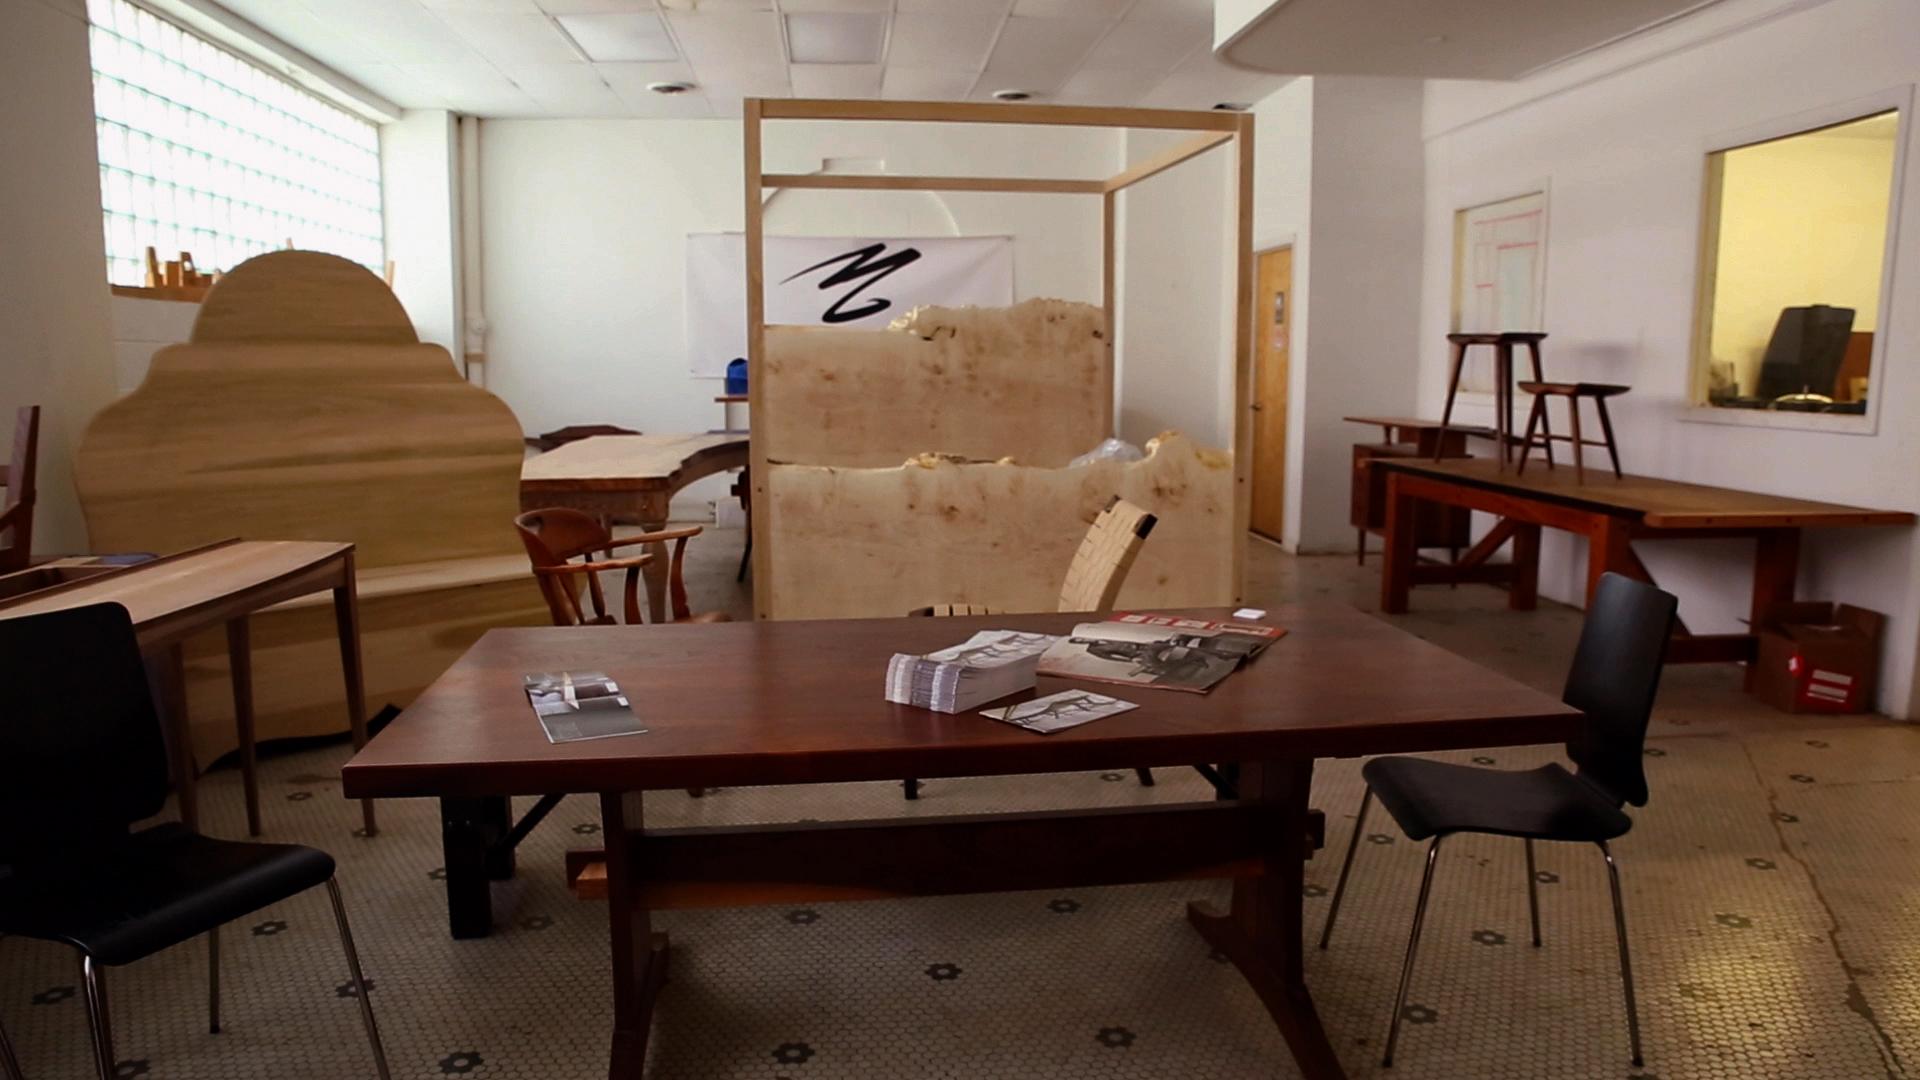 Goebel & Company Furniture | TechCrunch Makers